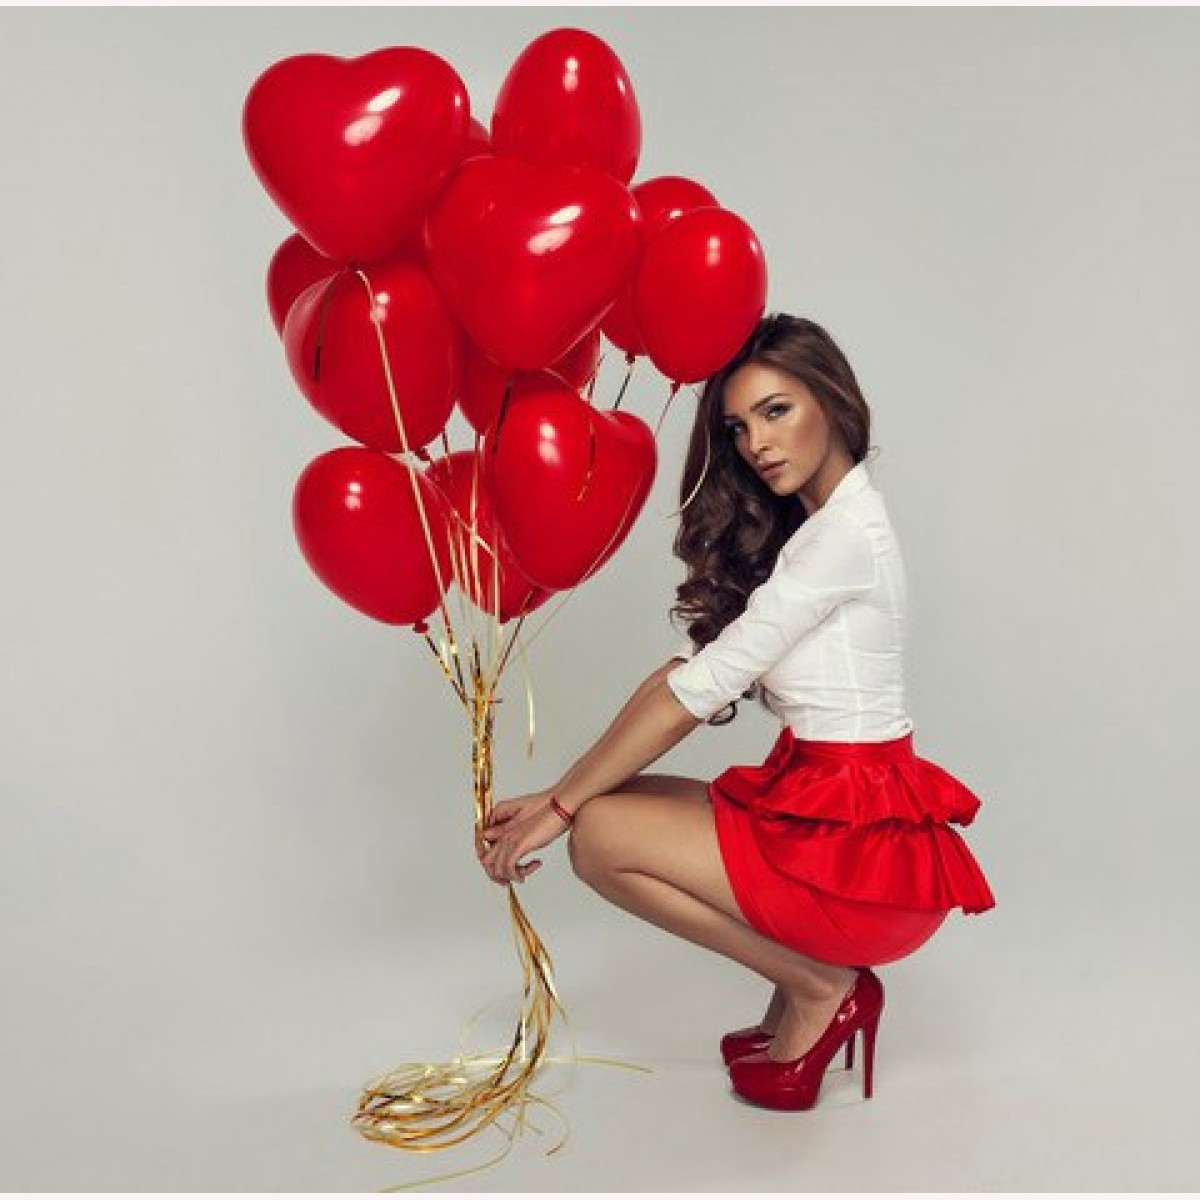 Фото девушки с шариком сердцем